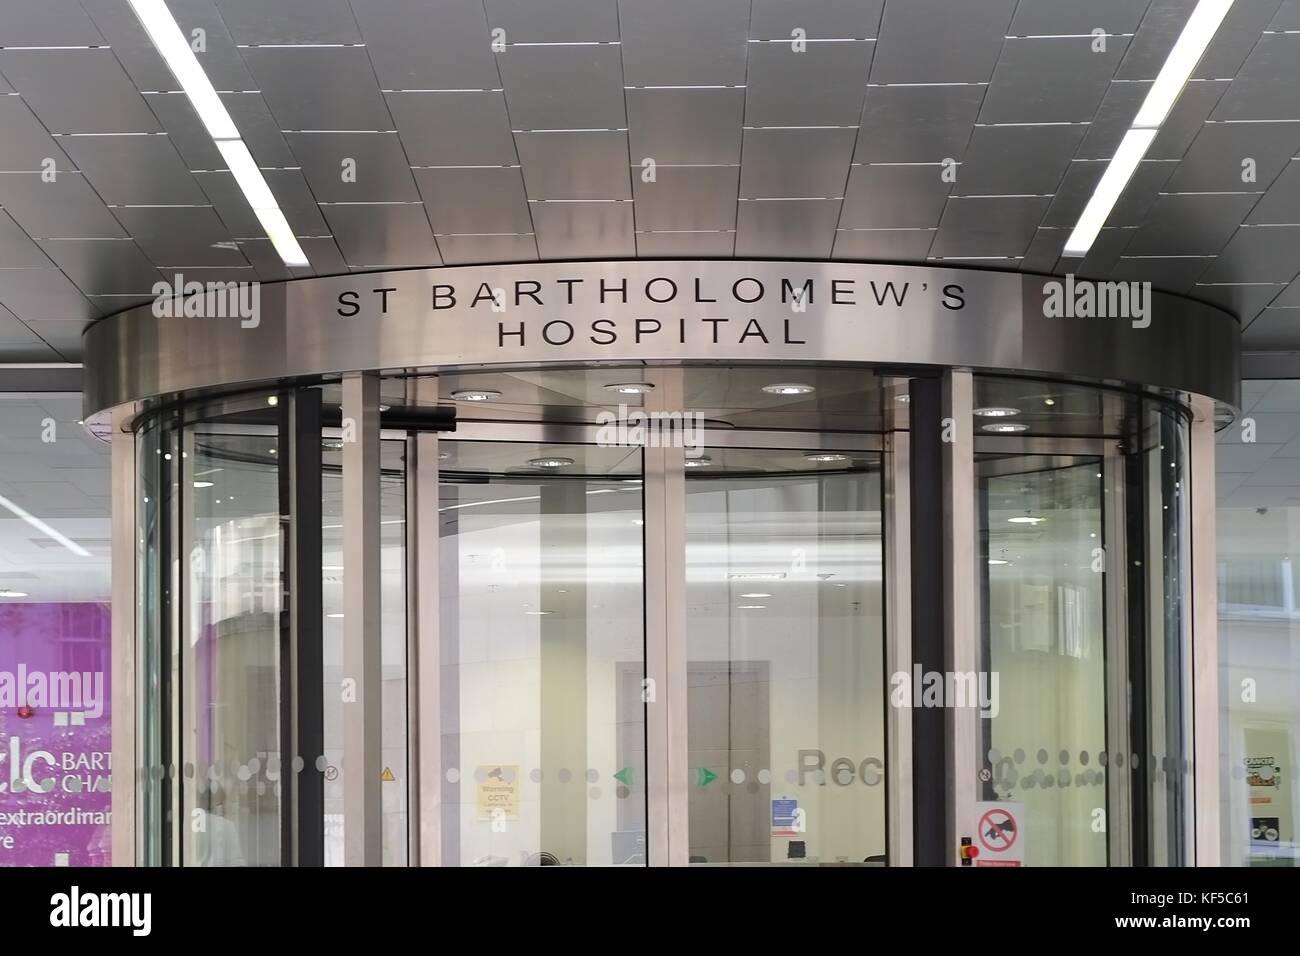 Barts Heart Centre St Bartholomew's Hospital (Barts), is a leading, internationally renowned teaching hospital based - Stock Image